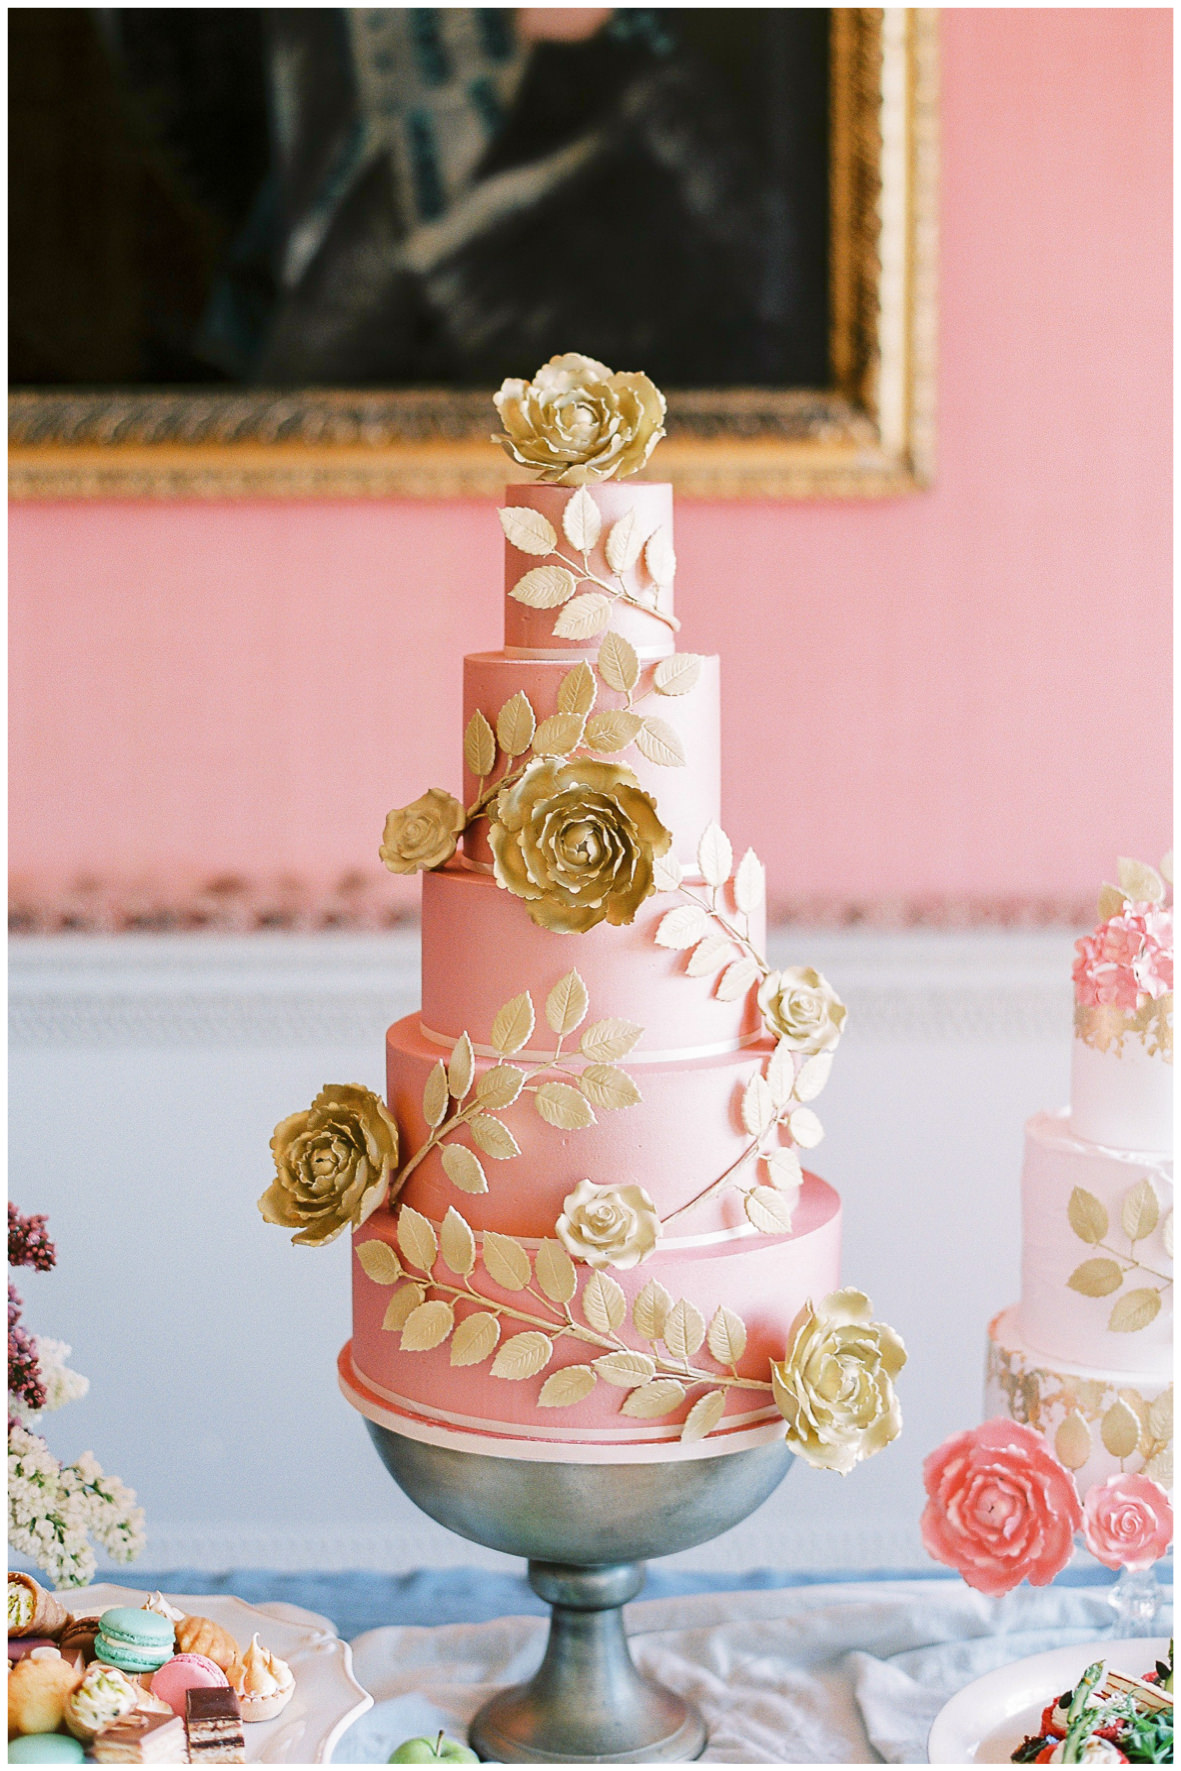 Lucy Davenport Photography, Holdenby House, wedding venue, Northamptonshire, dessert station, Princess Patisserie, wedding cake,